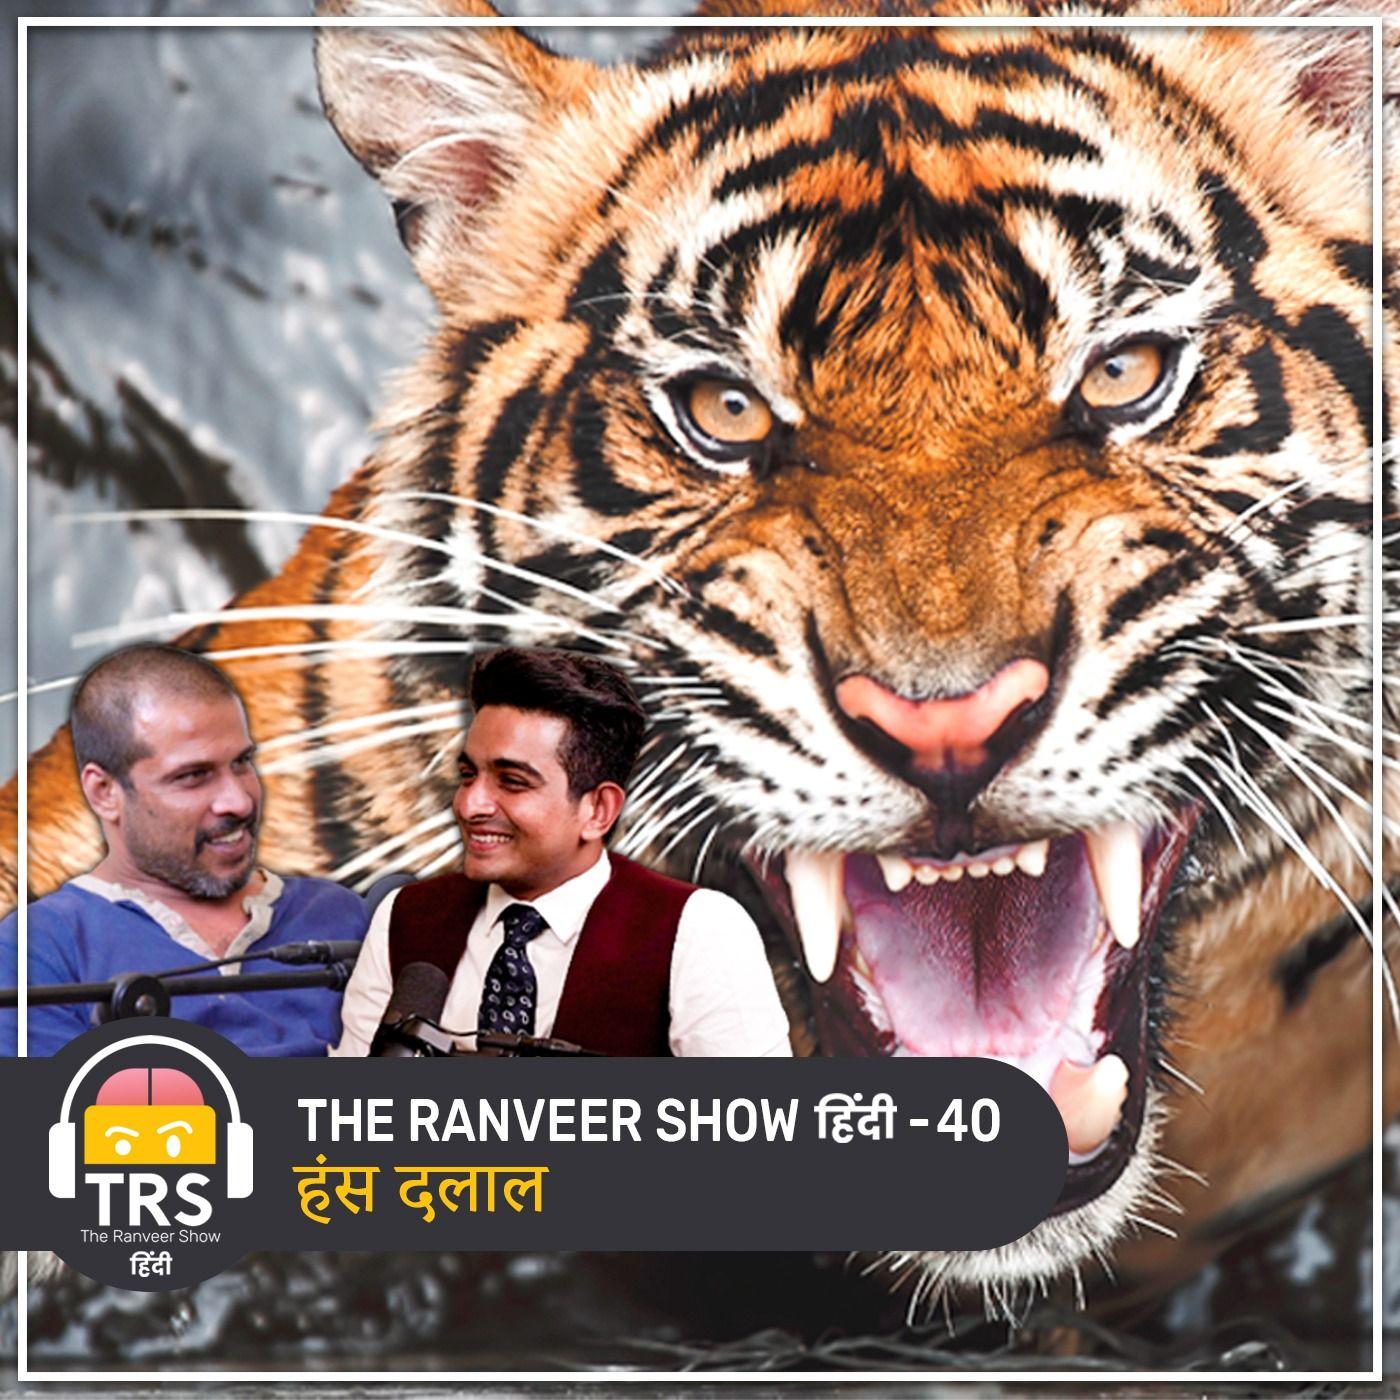 REAL LIFE Jungle Man - Hans Dalal | Indian Forest Deadly Stories | The Ranveer Show हिंदी 40